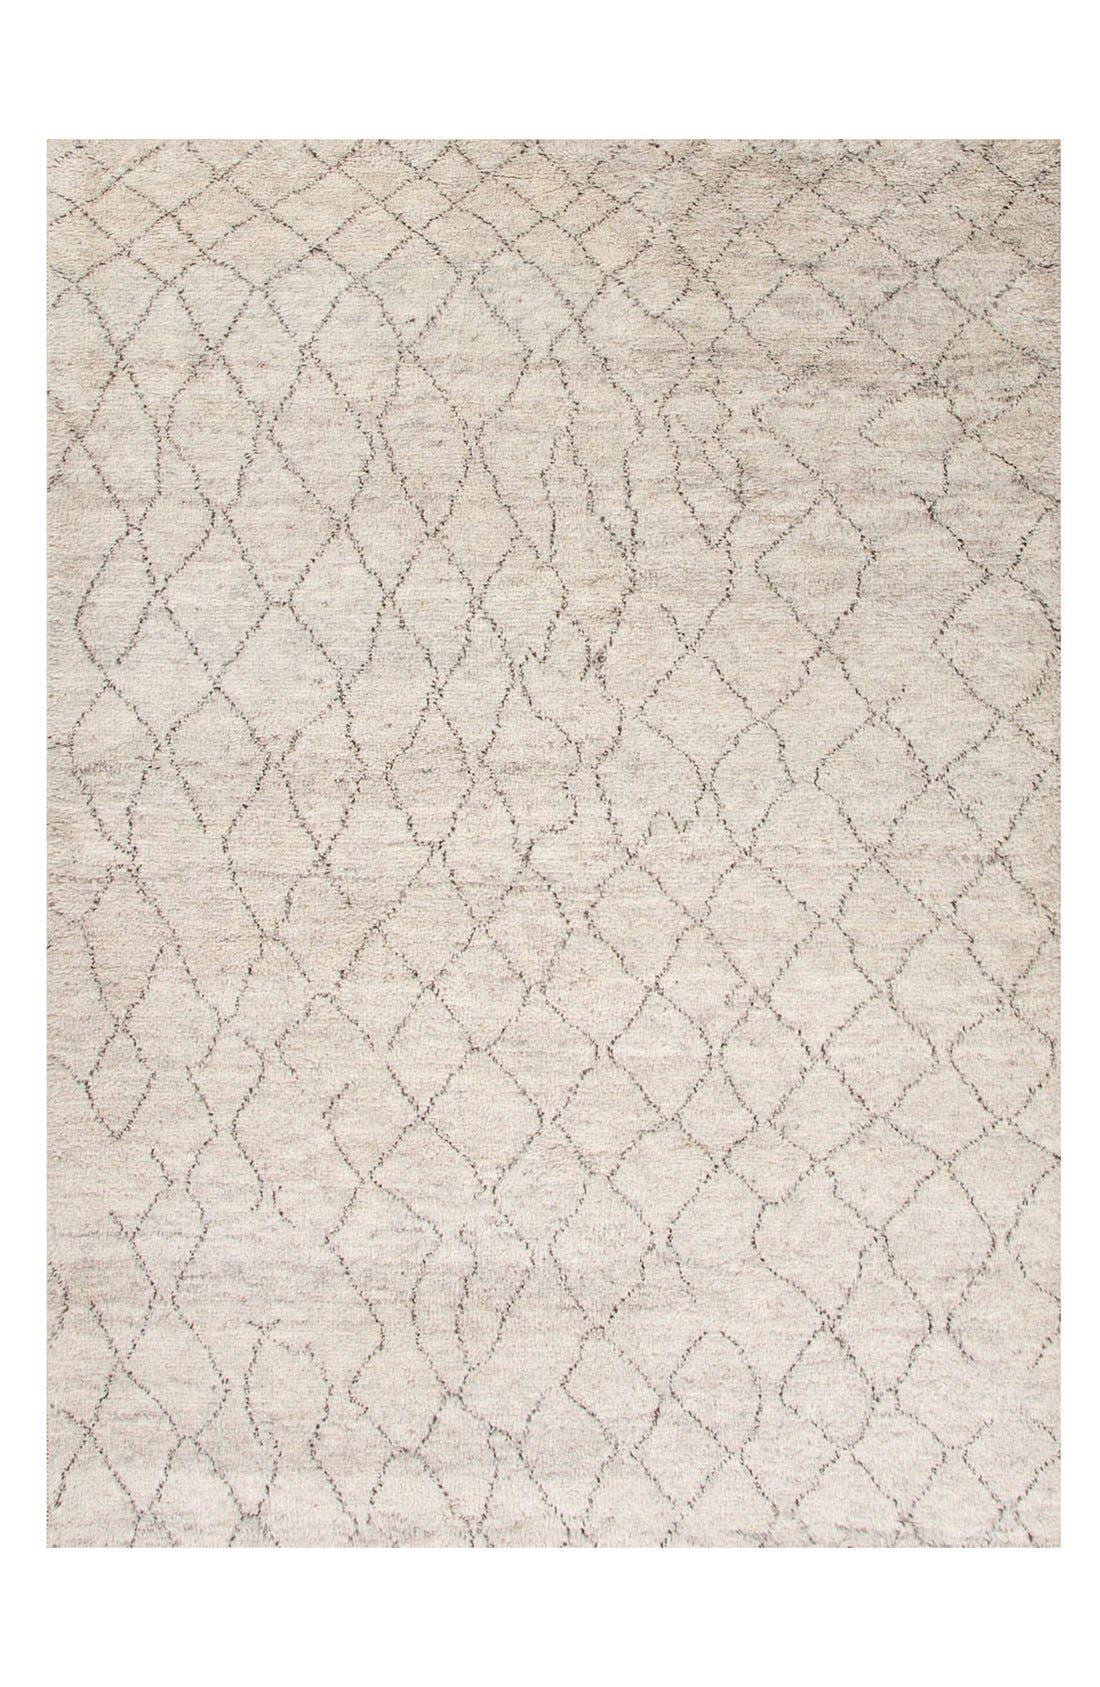 'Zola Irregular Lines' Wool Rug,                         Main,                         color, IVORY/ BROWN